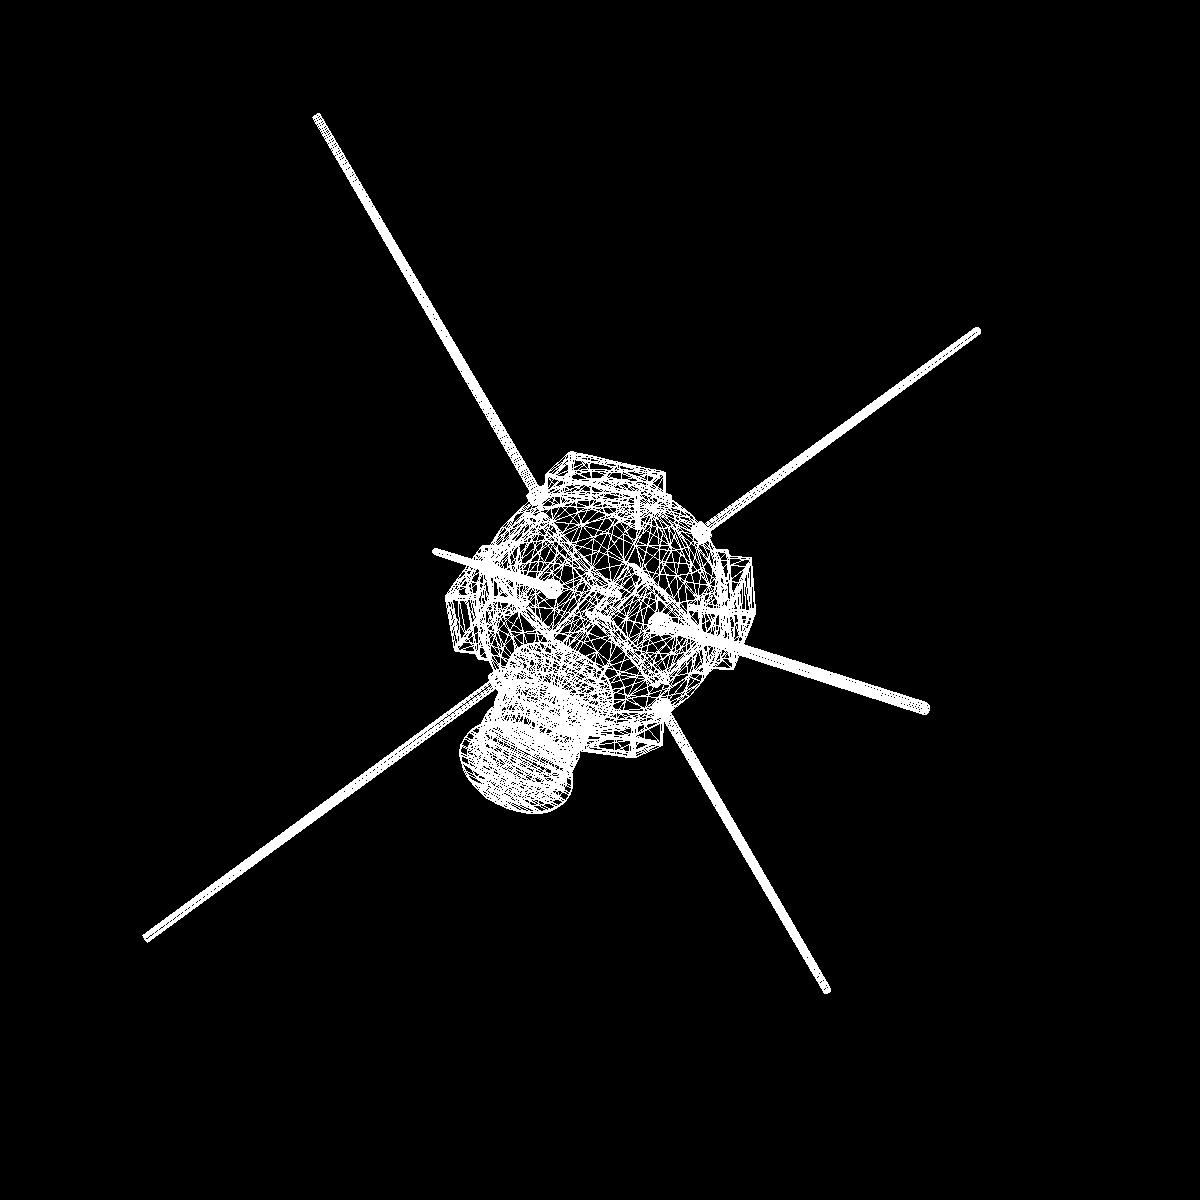 vanguard i satellite 3d model 3ds dxf fbx blend cob dae x obj 163934